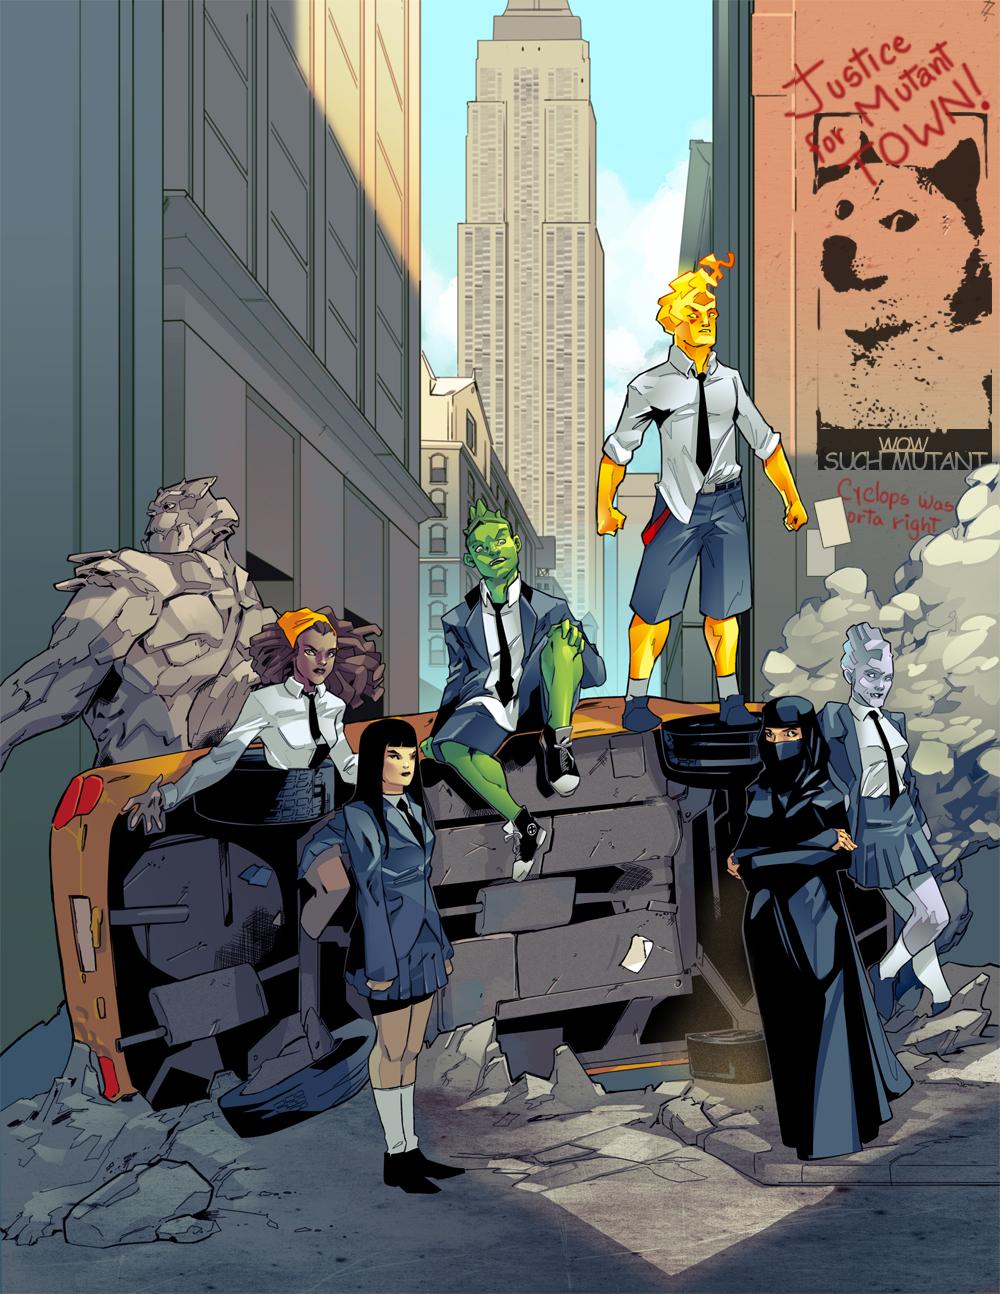 X-men Out downtown by Graconius